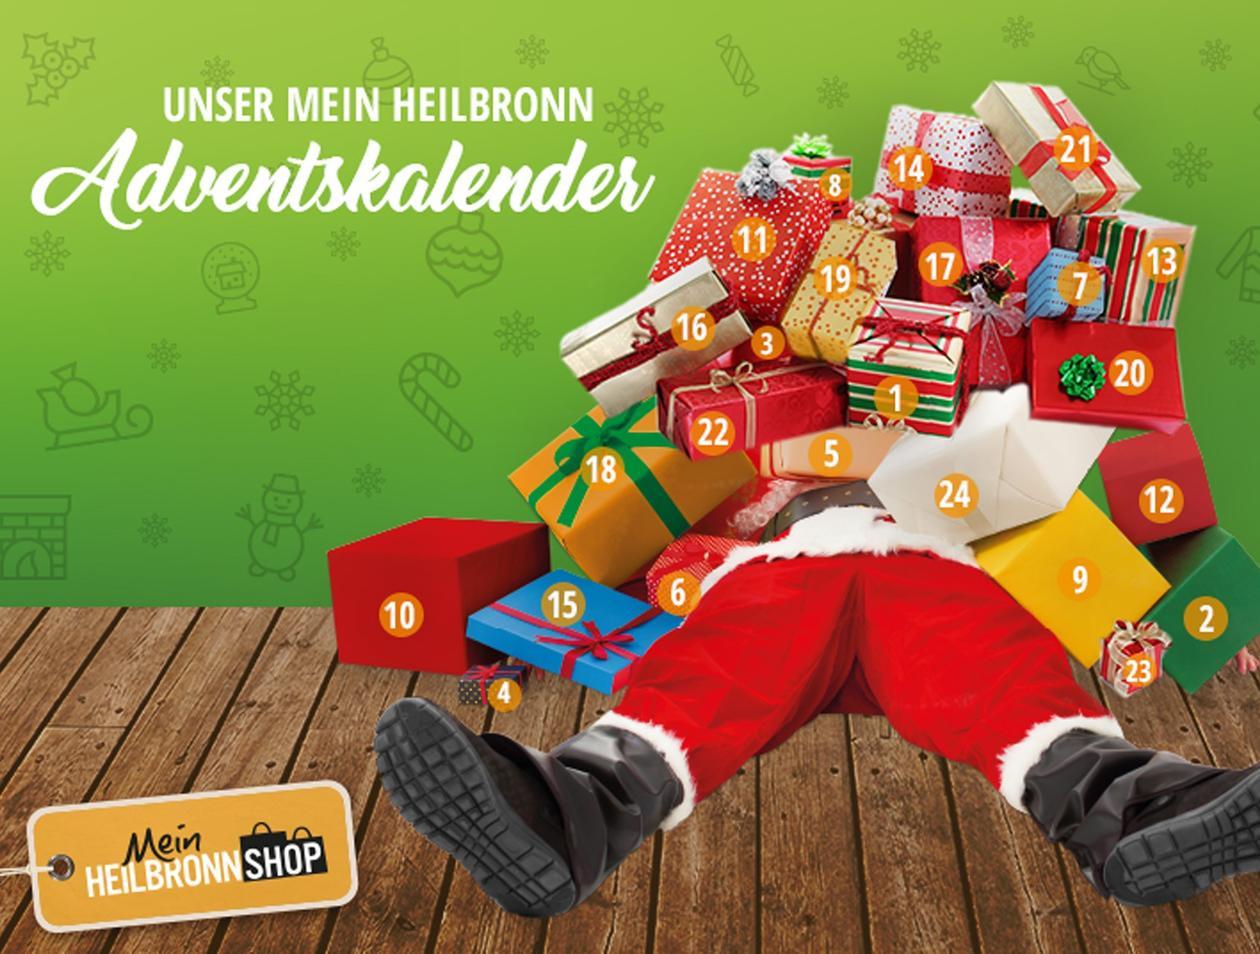 Adventskalender Heilbronn